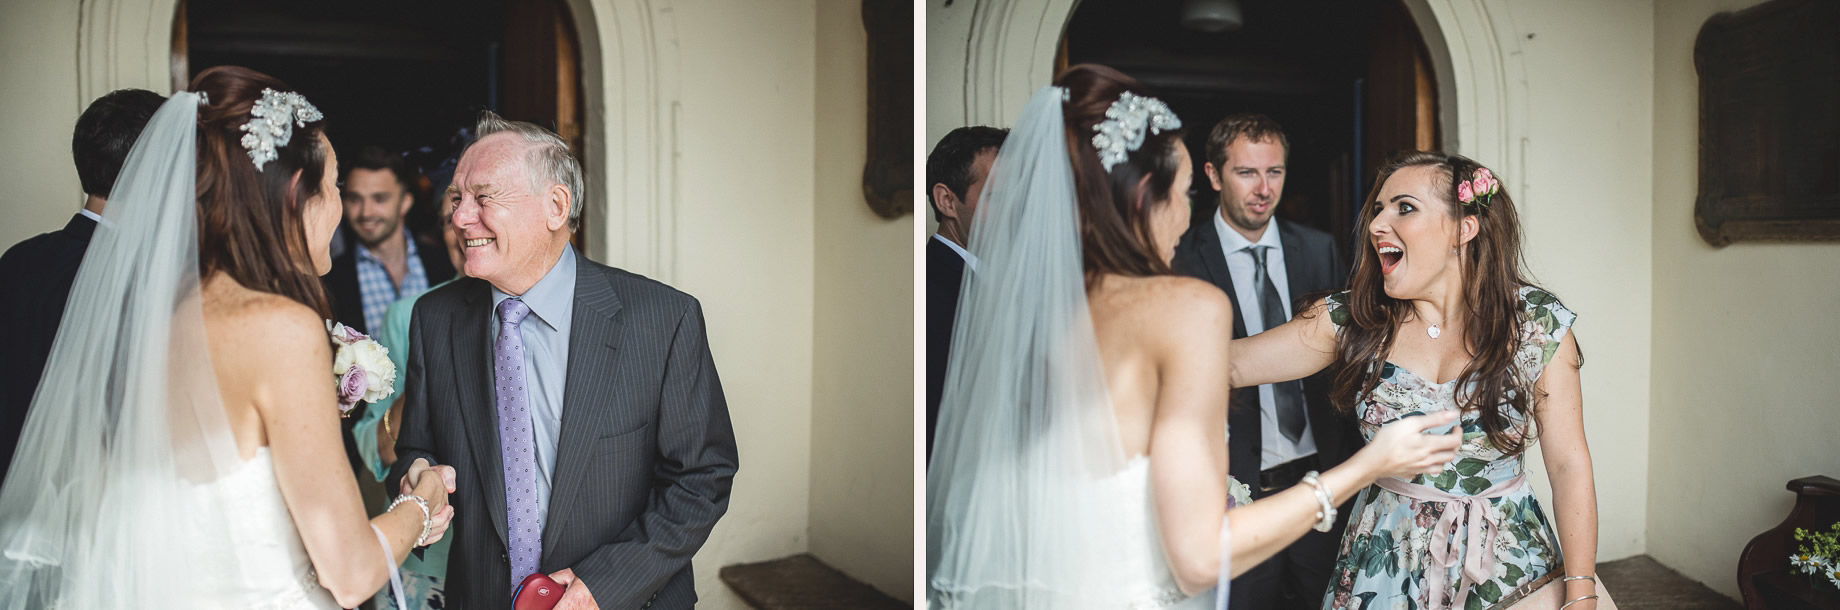 Helen and Matt's Wedding at Mitton Hall 053